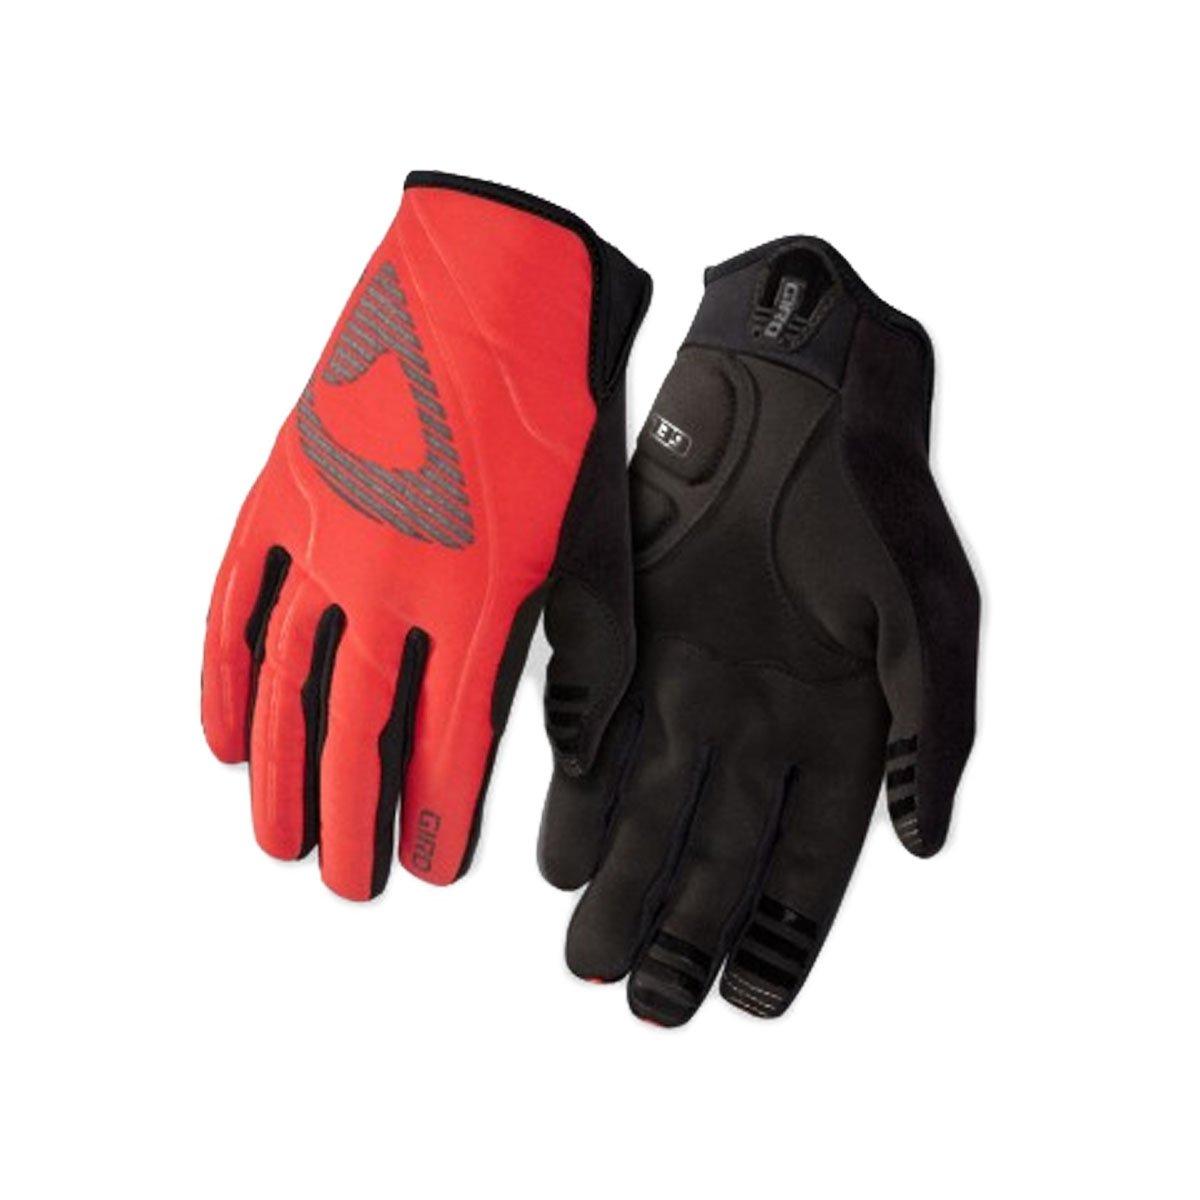 XS Giro GA09070 Mens Blaze Winter Gloves Glowing Red